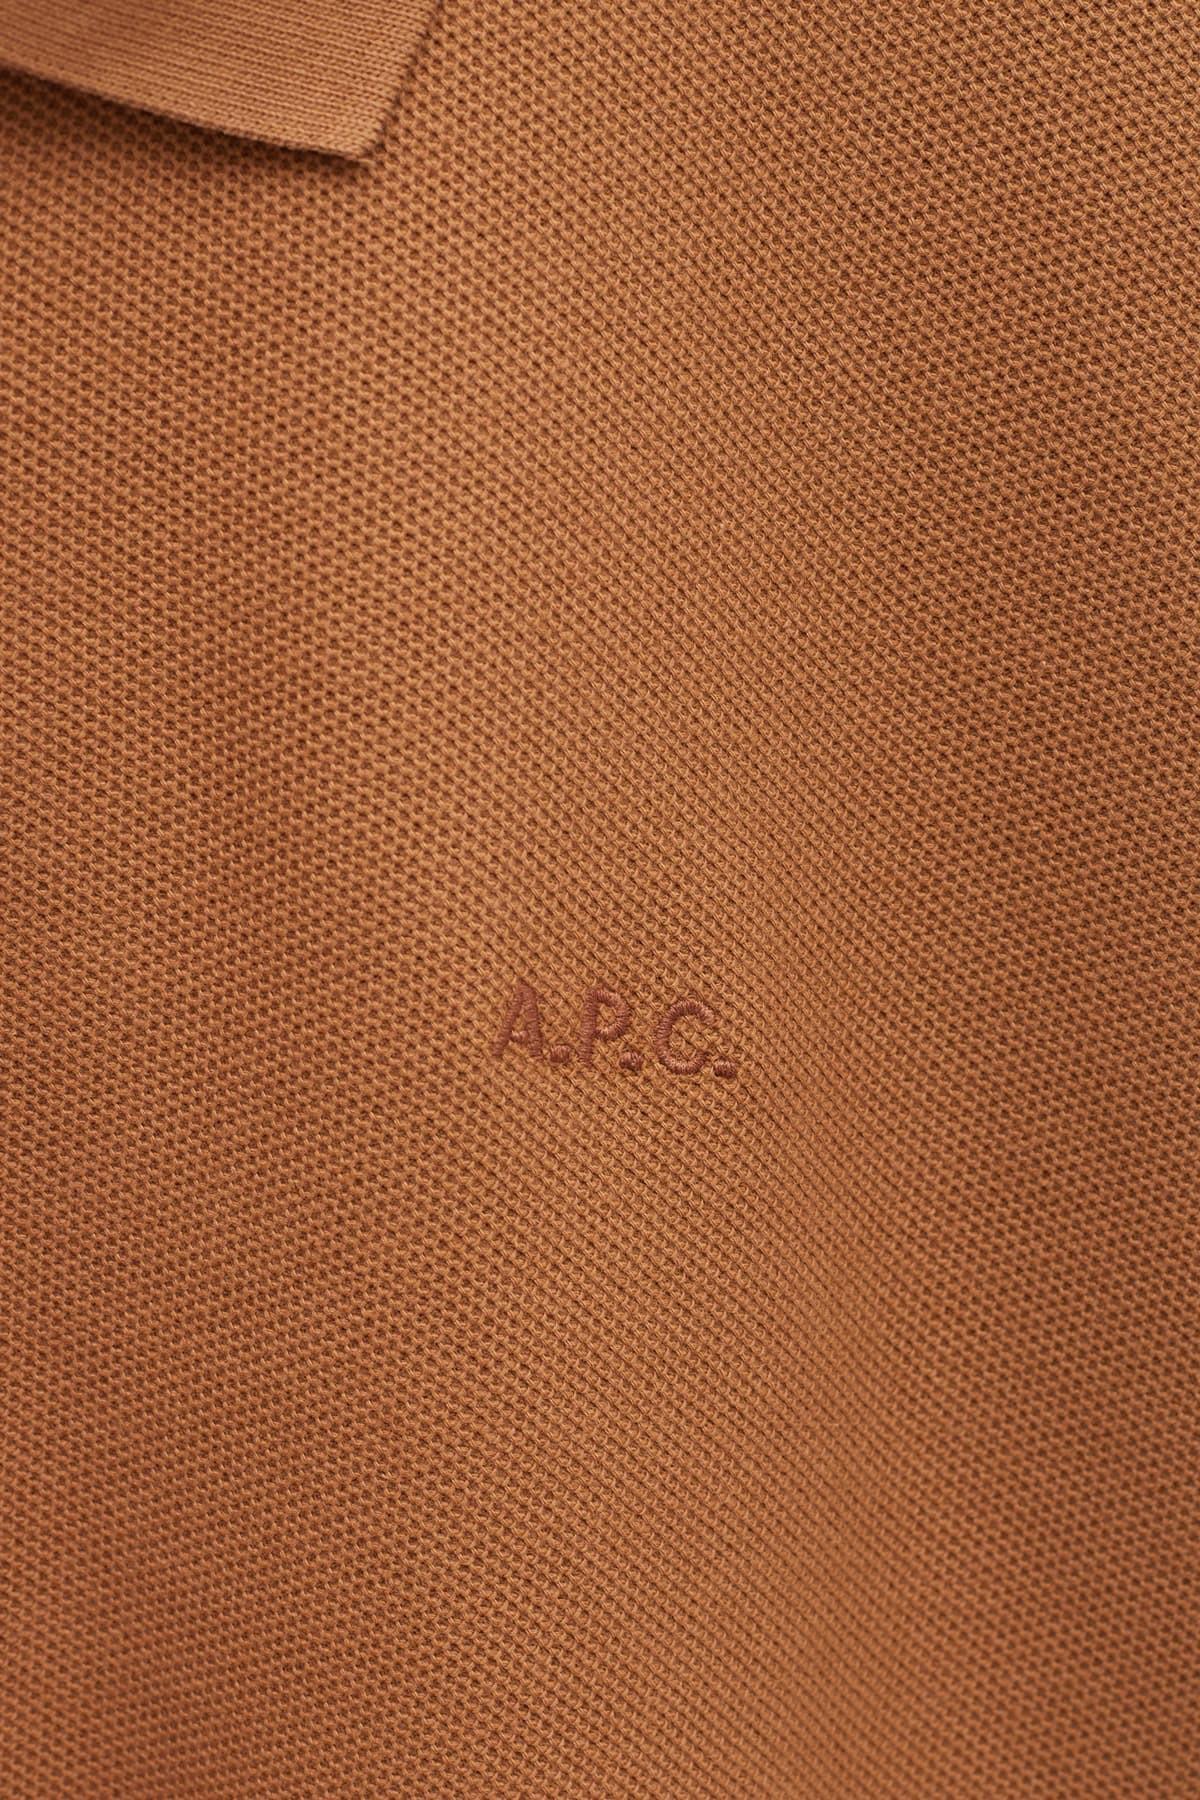 Loreak Mendian Navy Sofo Short Trouser